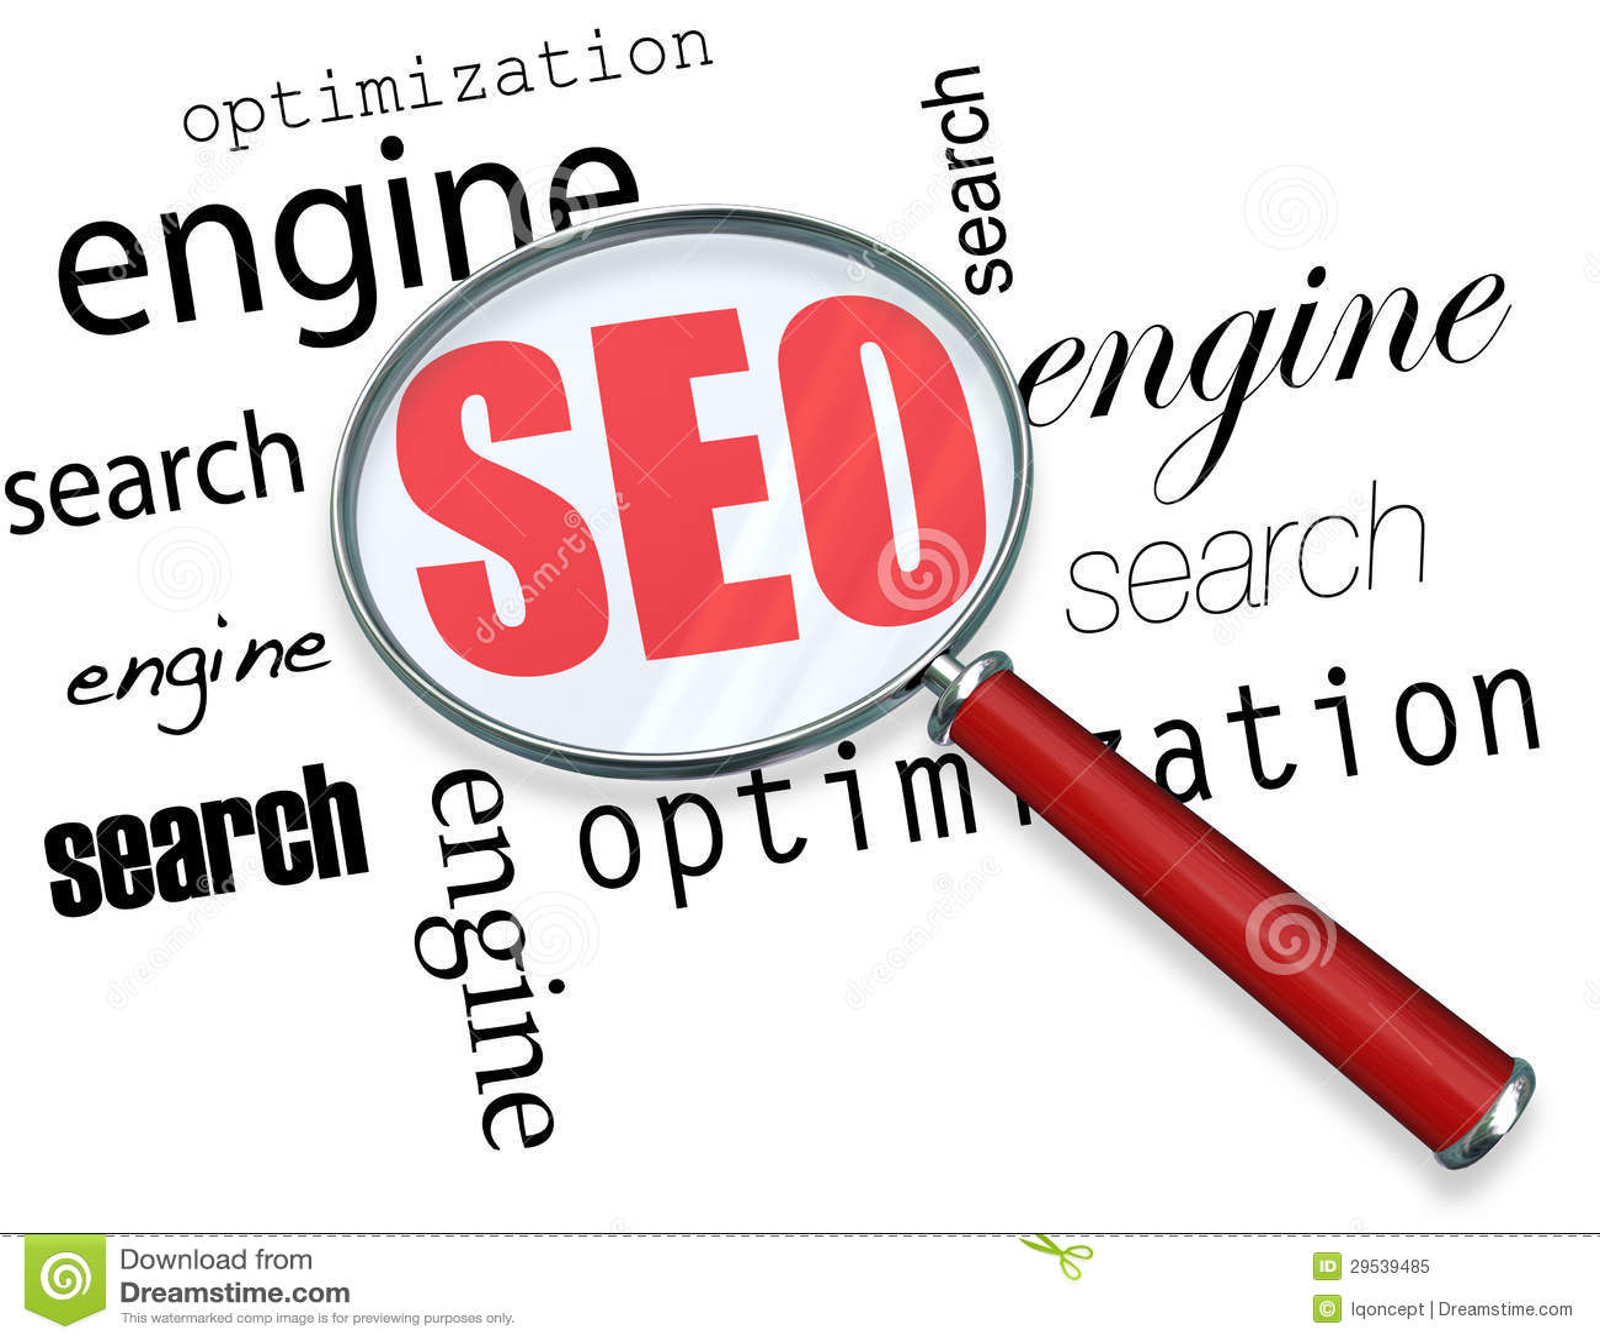 Otimização do Search Engine - lupa